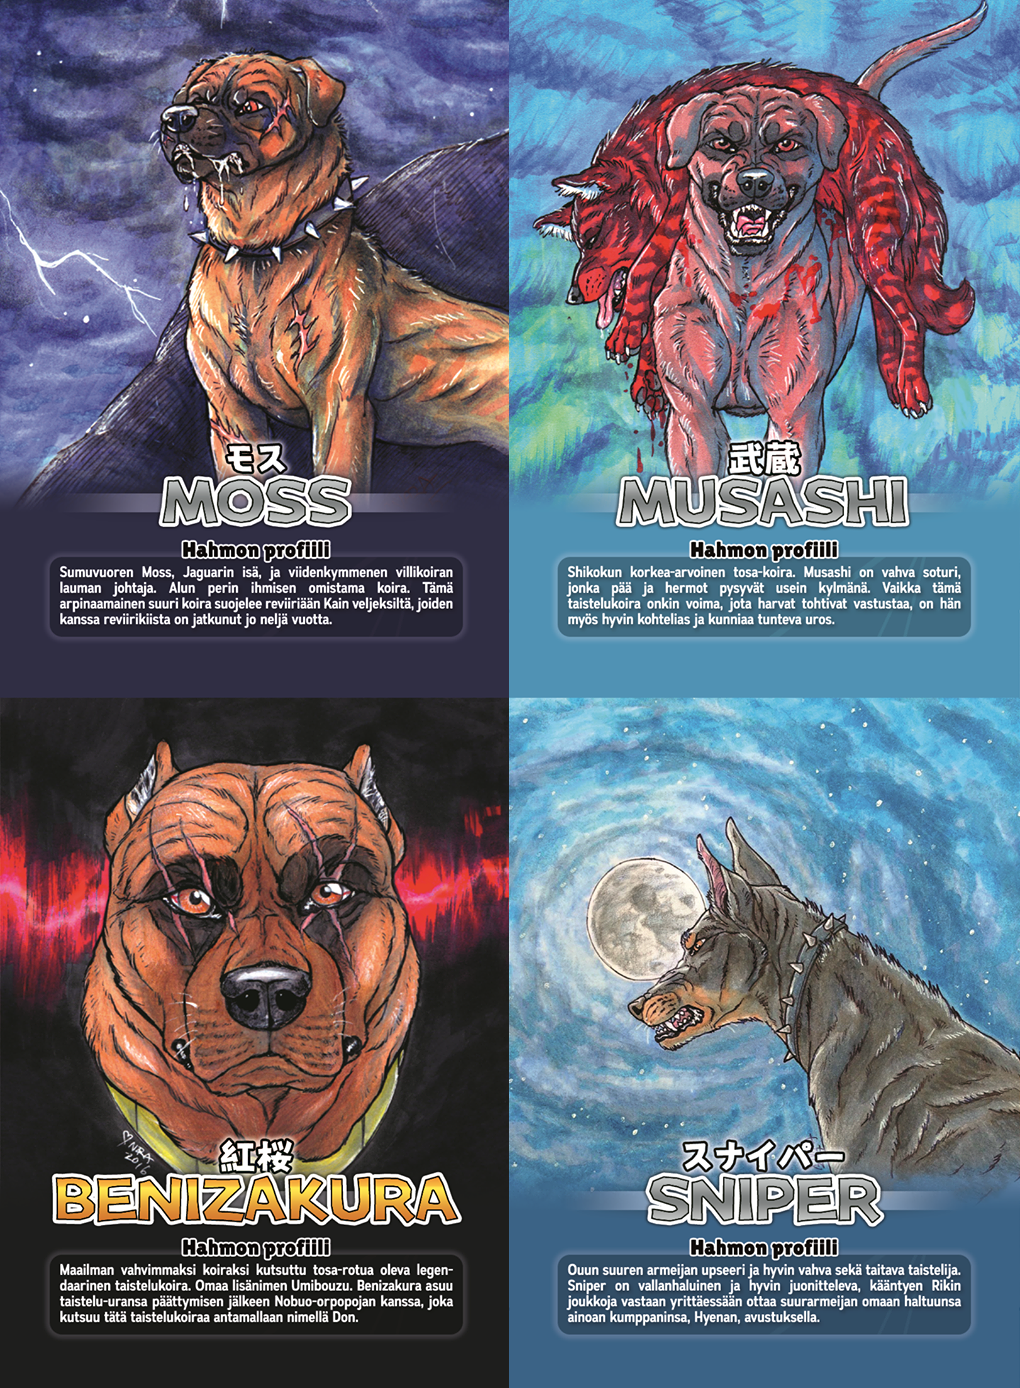 Trading Card Illustrations